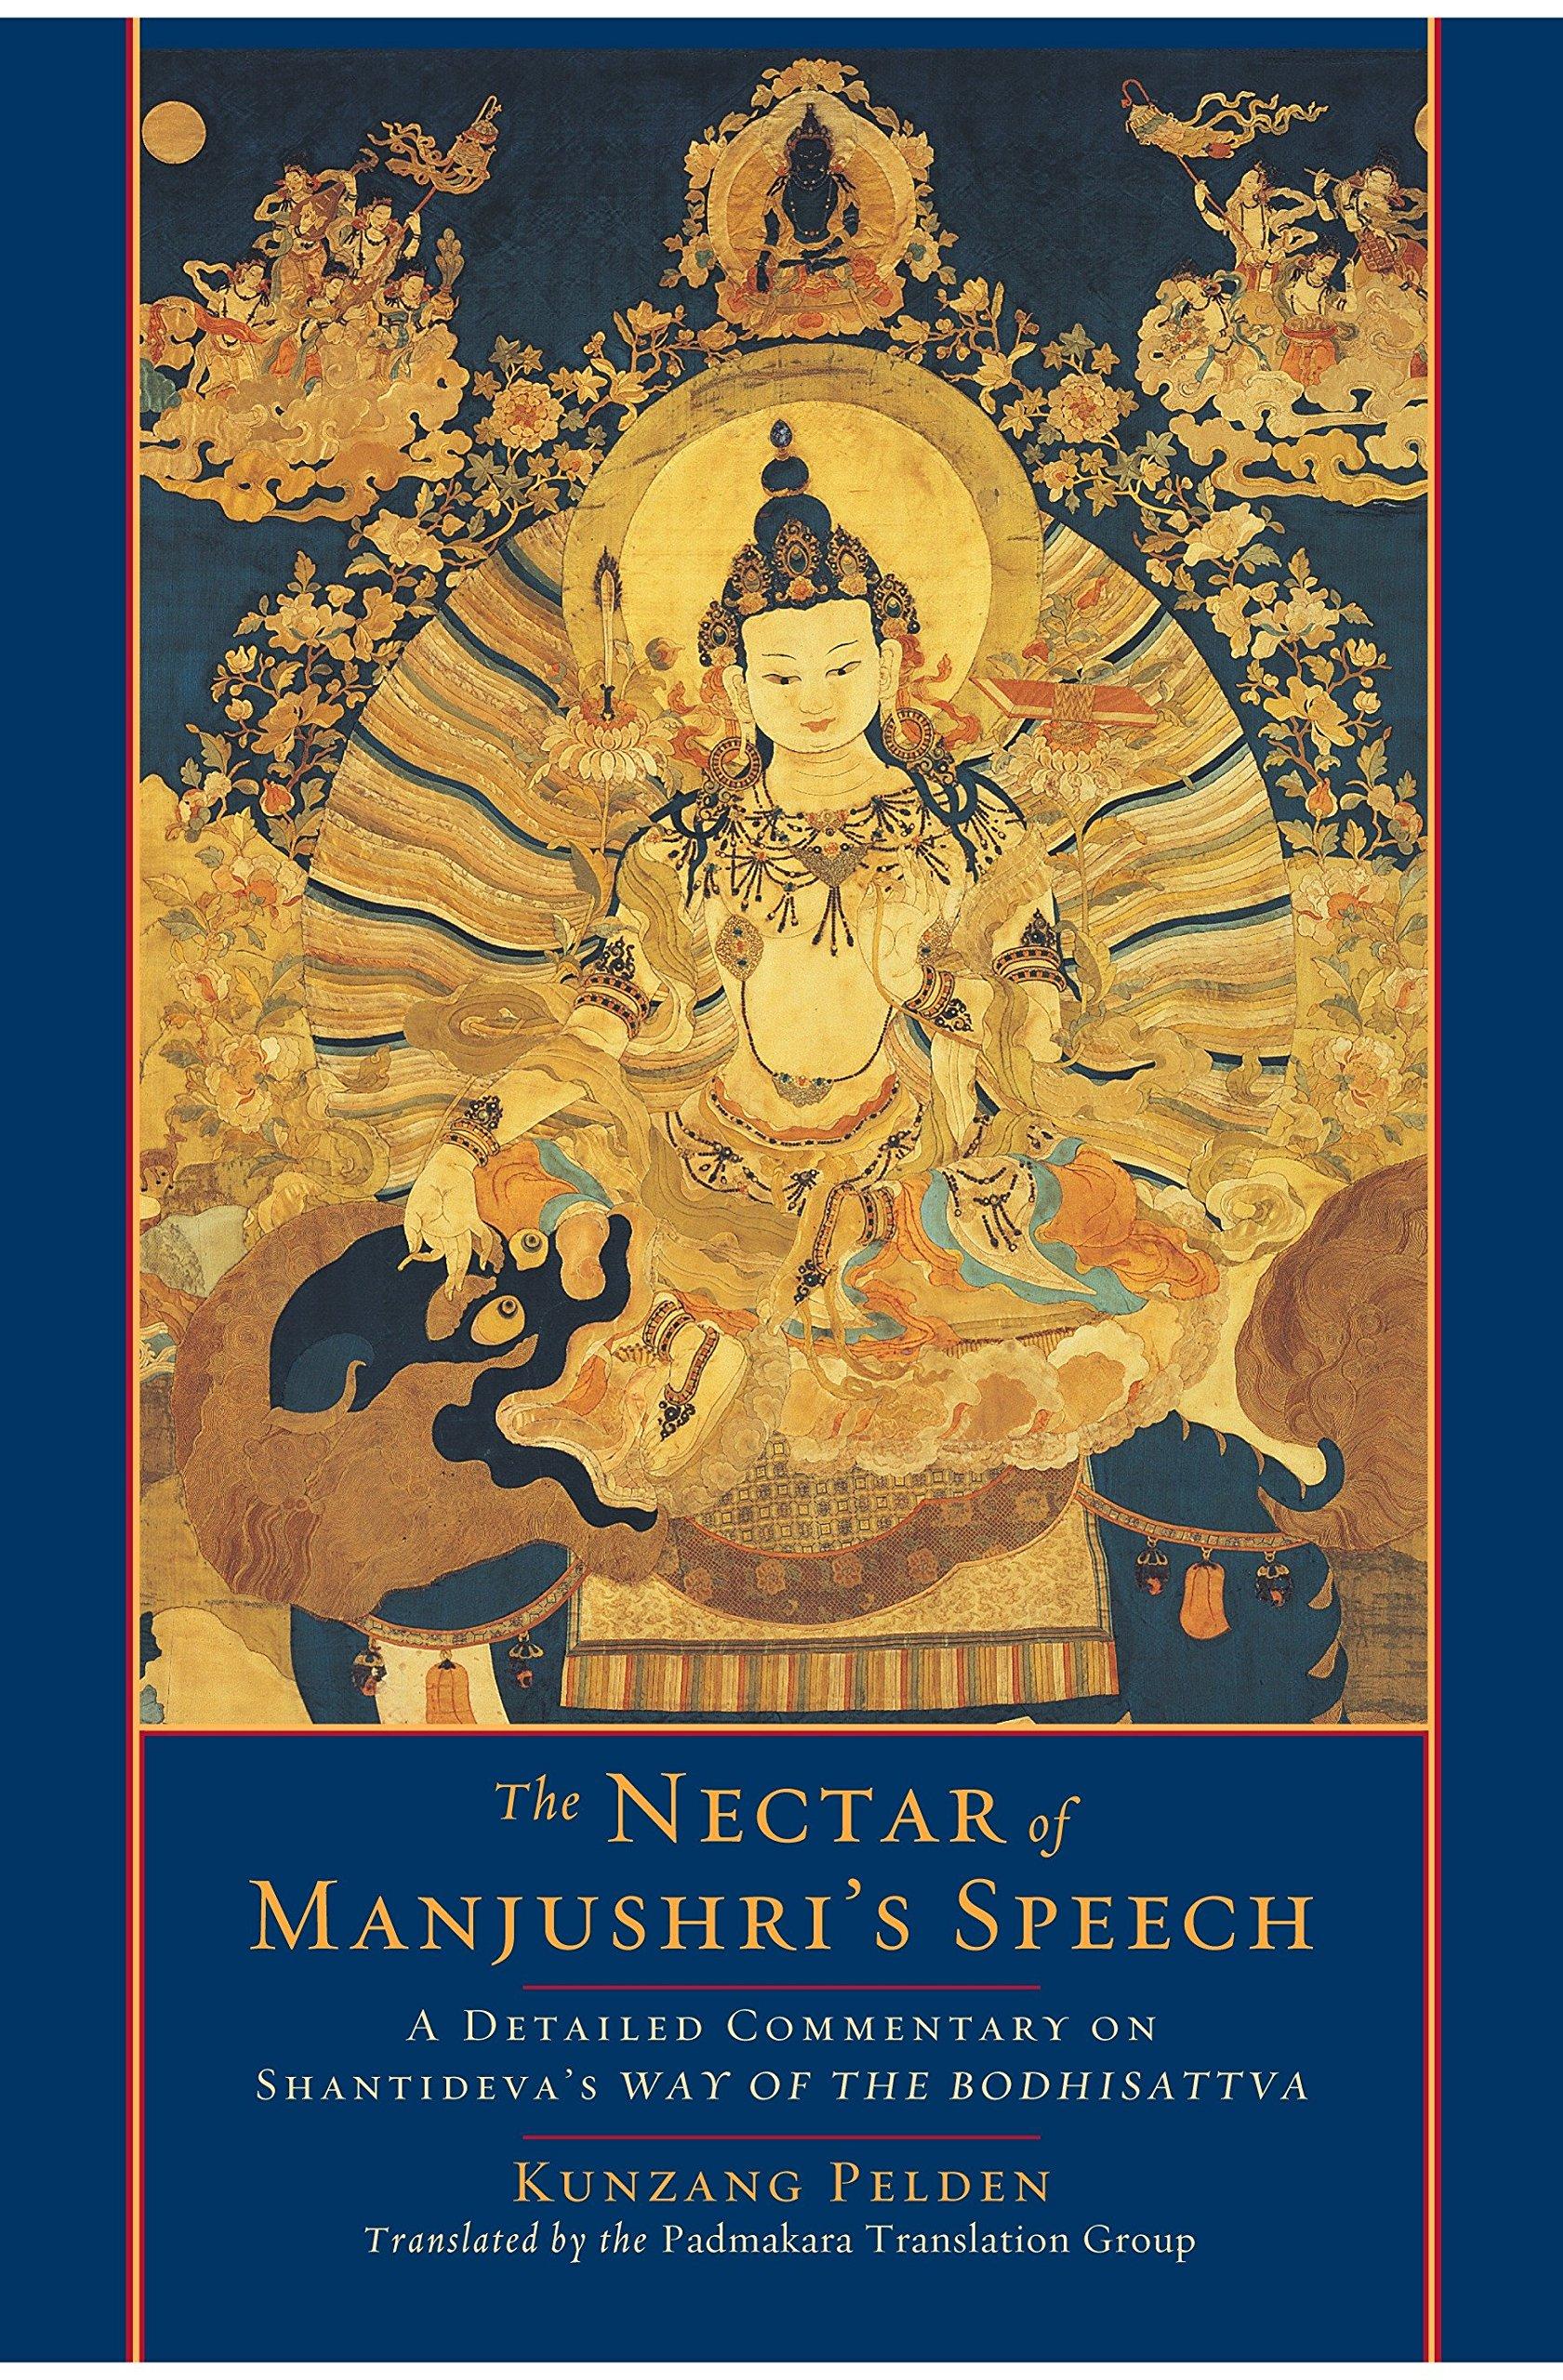 The Nectar Of Manjushri's Speech  A Detailed Commentary On Shantideva's Way Of The Bodhisattva